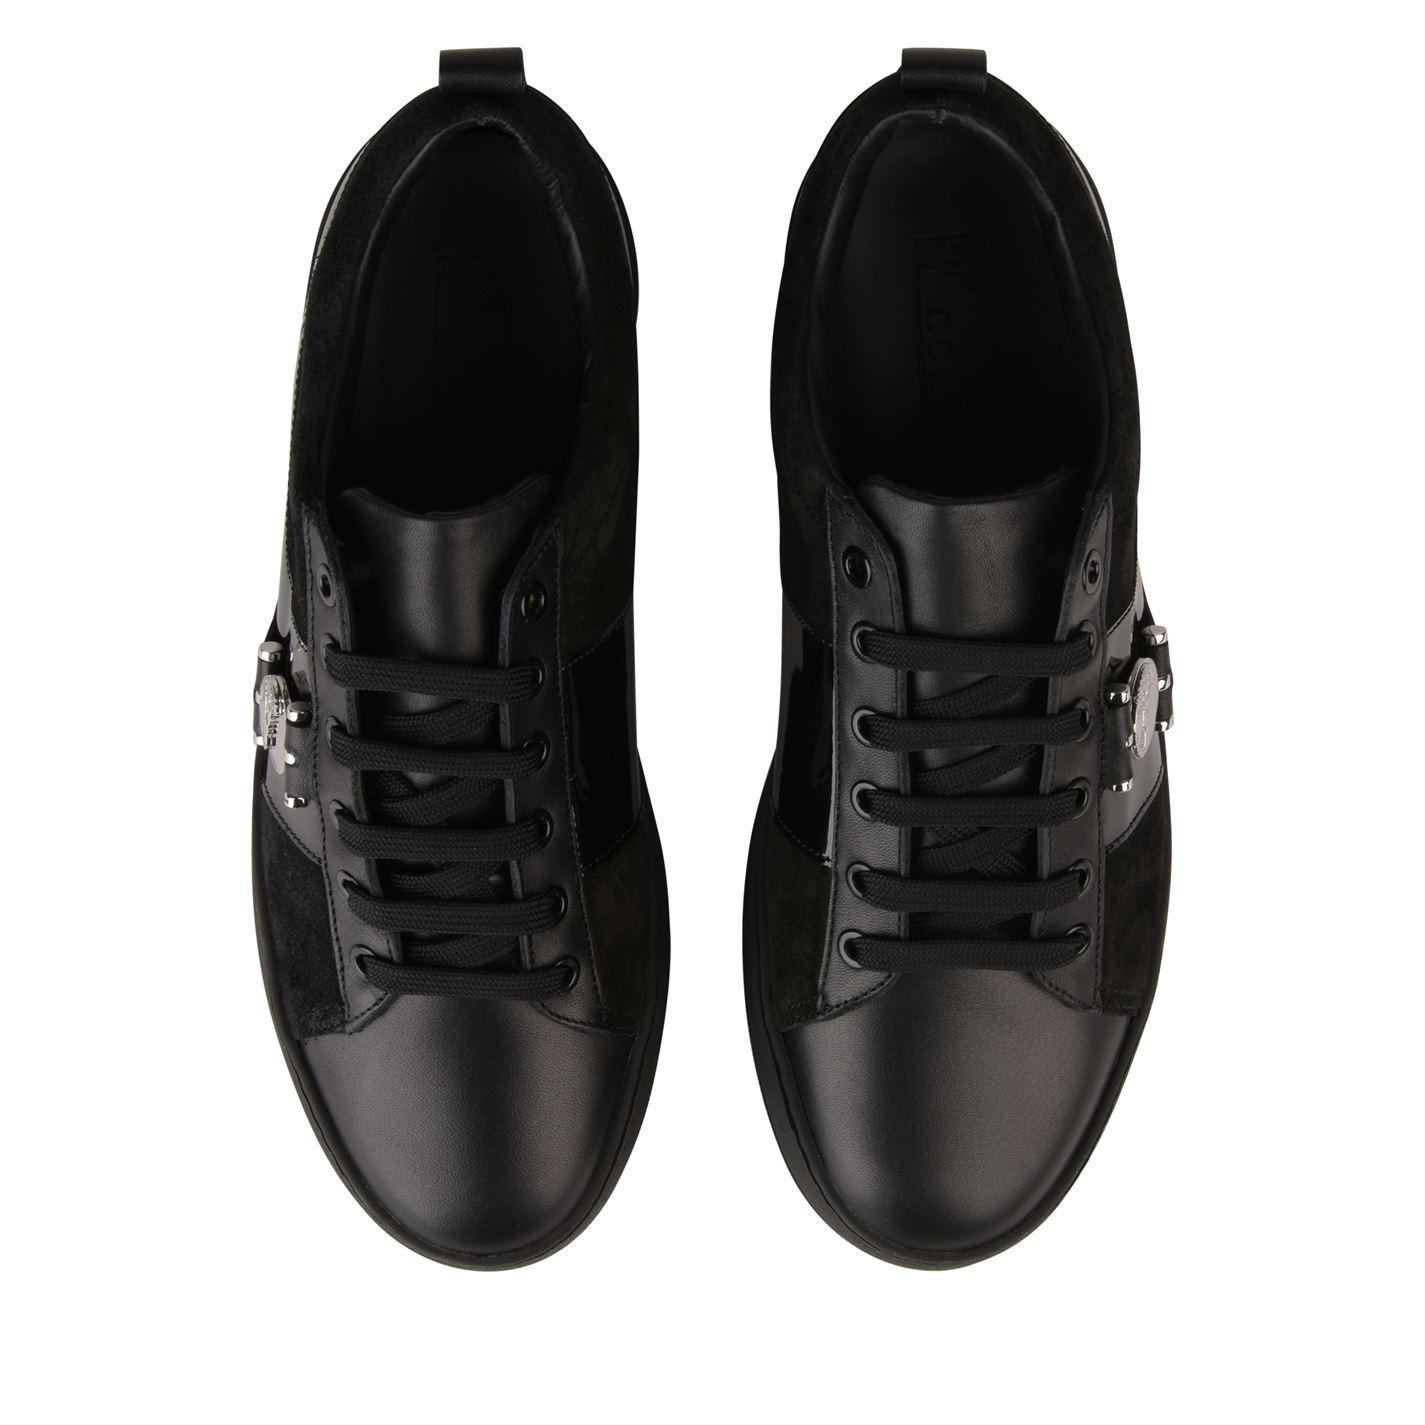 Versace Leather Medusa Nickel Logo Trainers in Black for Men